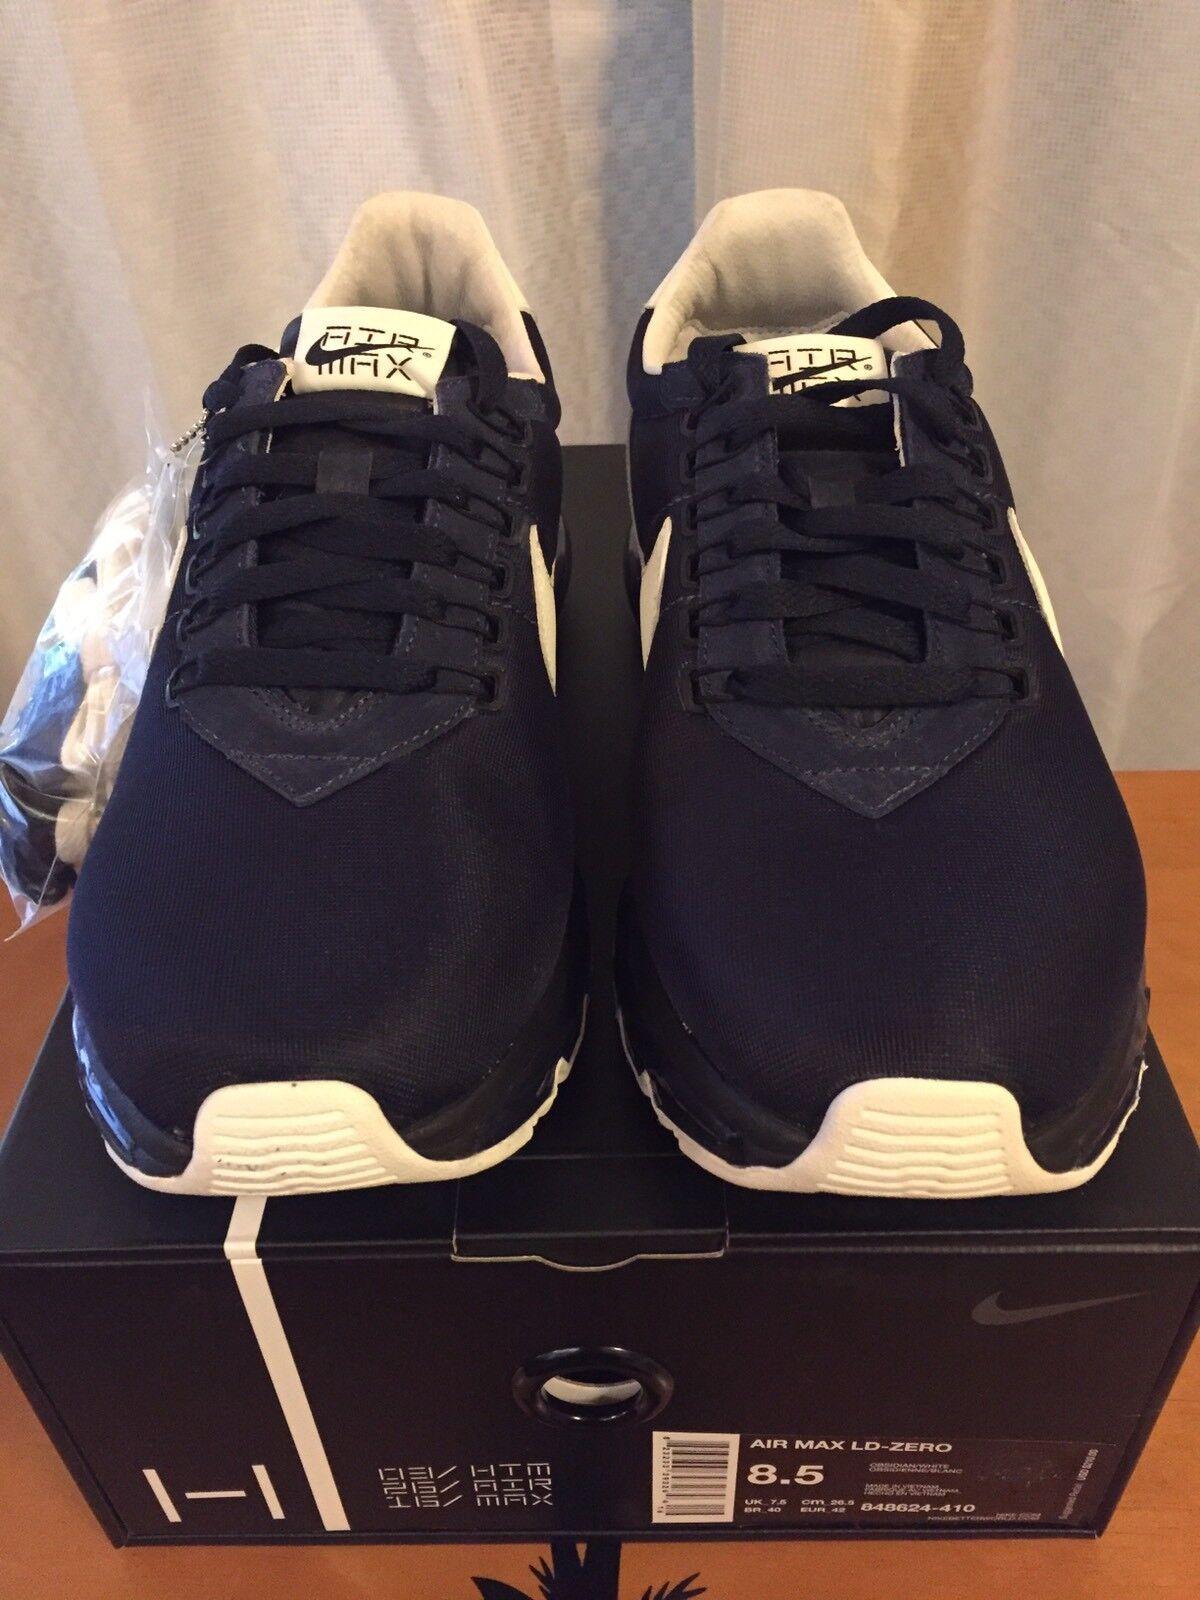 Nike Air Max LD-Zero Obsidian White HTM Hiroshi Fujiwara 848624 410 Sz 8.5